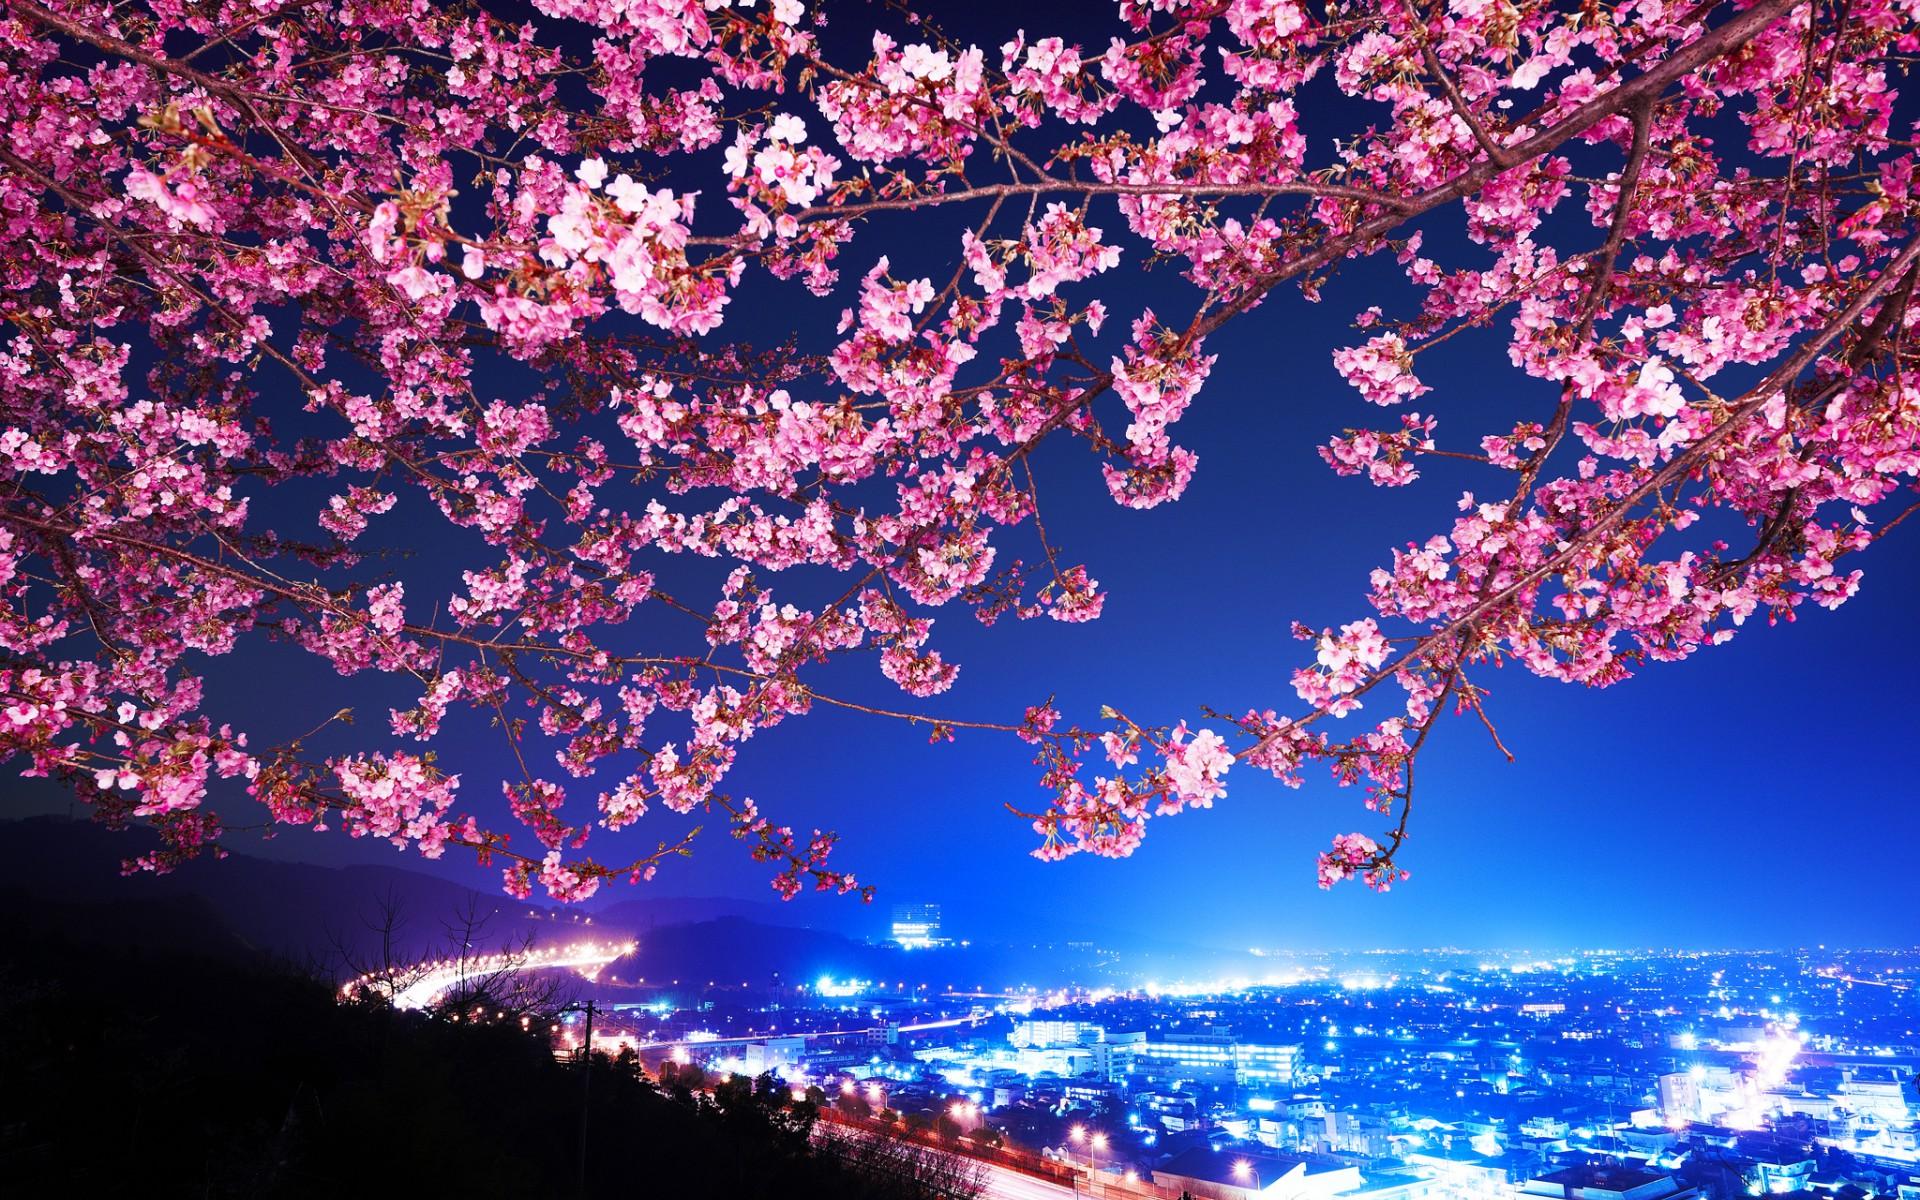 37 Japanese Cherry Blossom Wallpaper 1920x1080 On